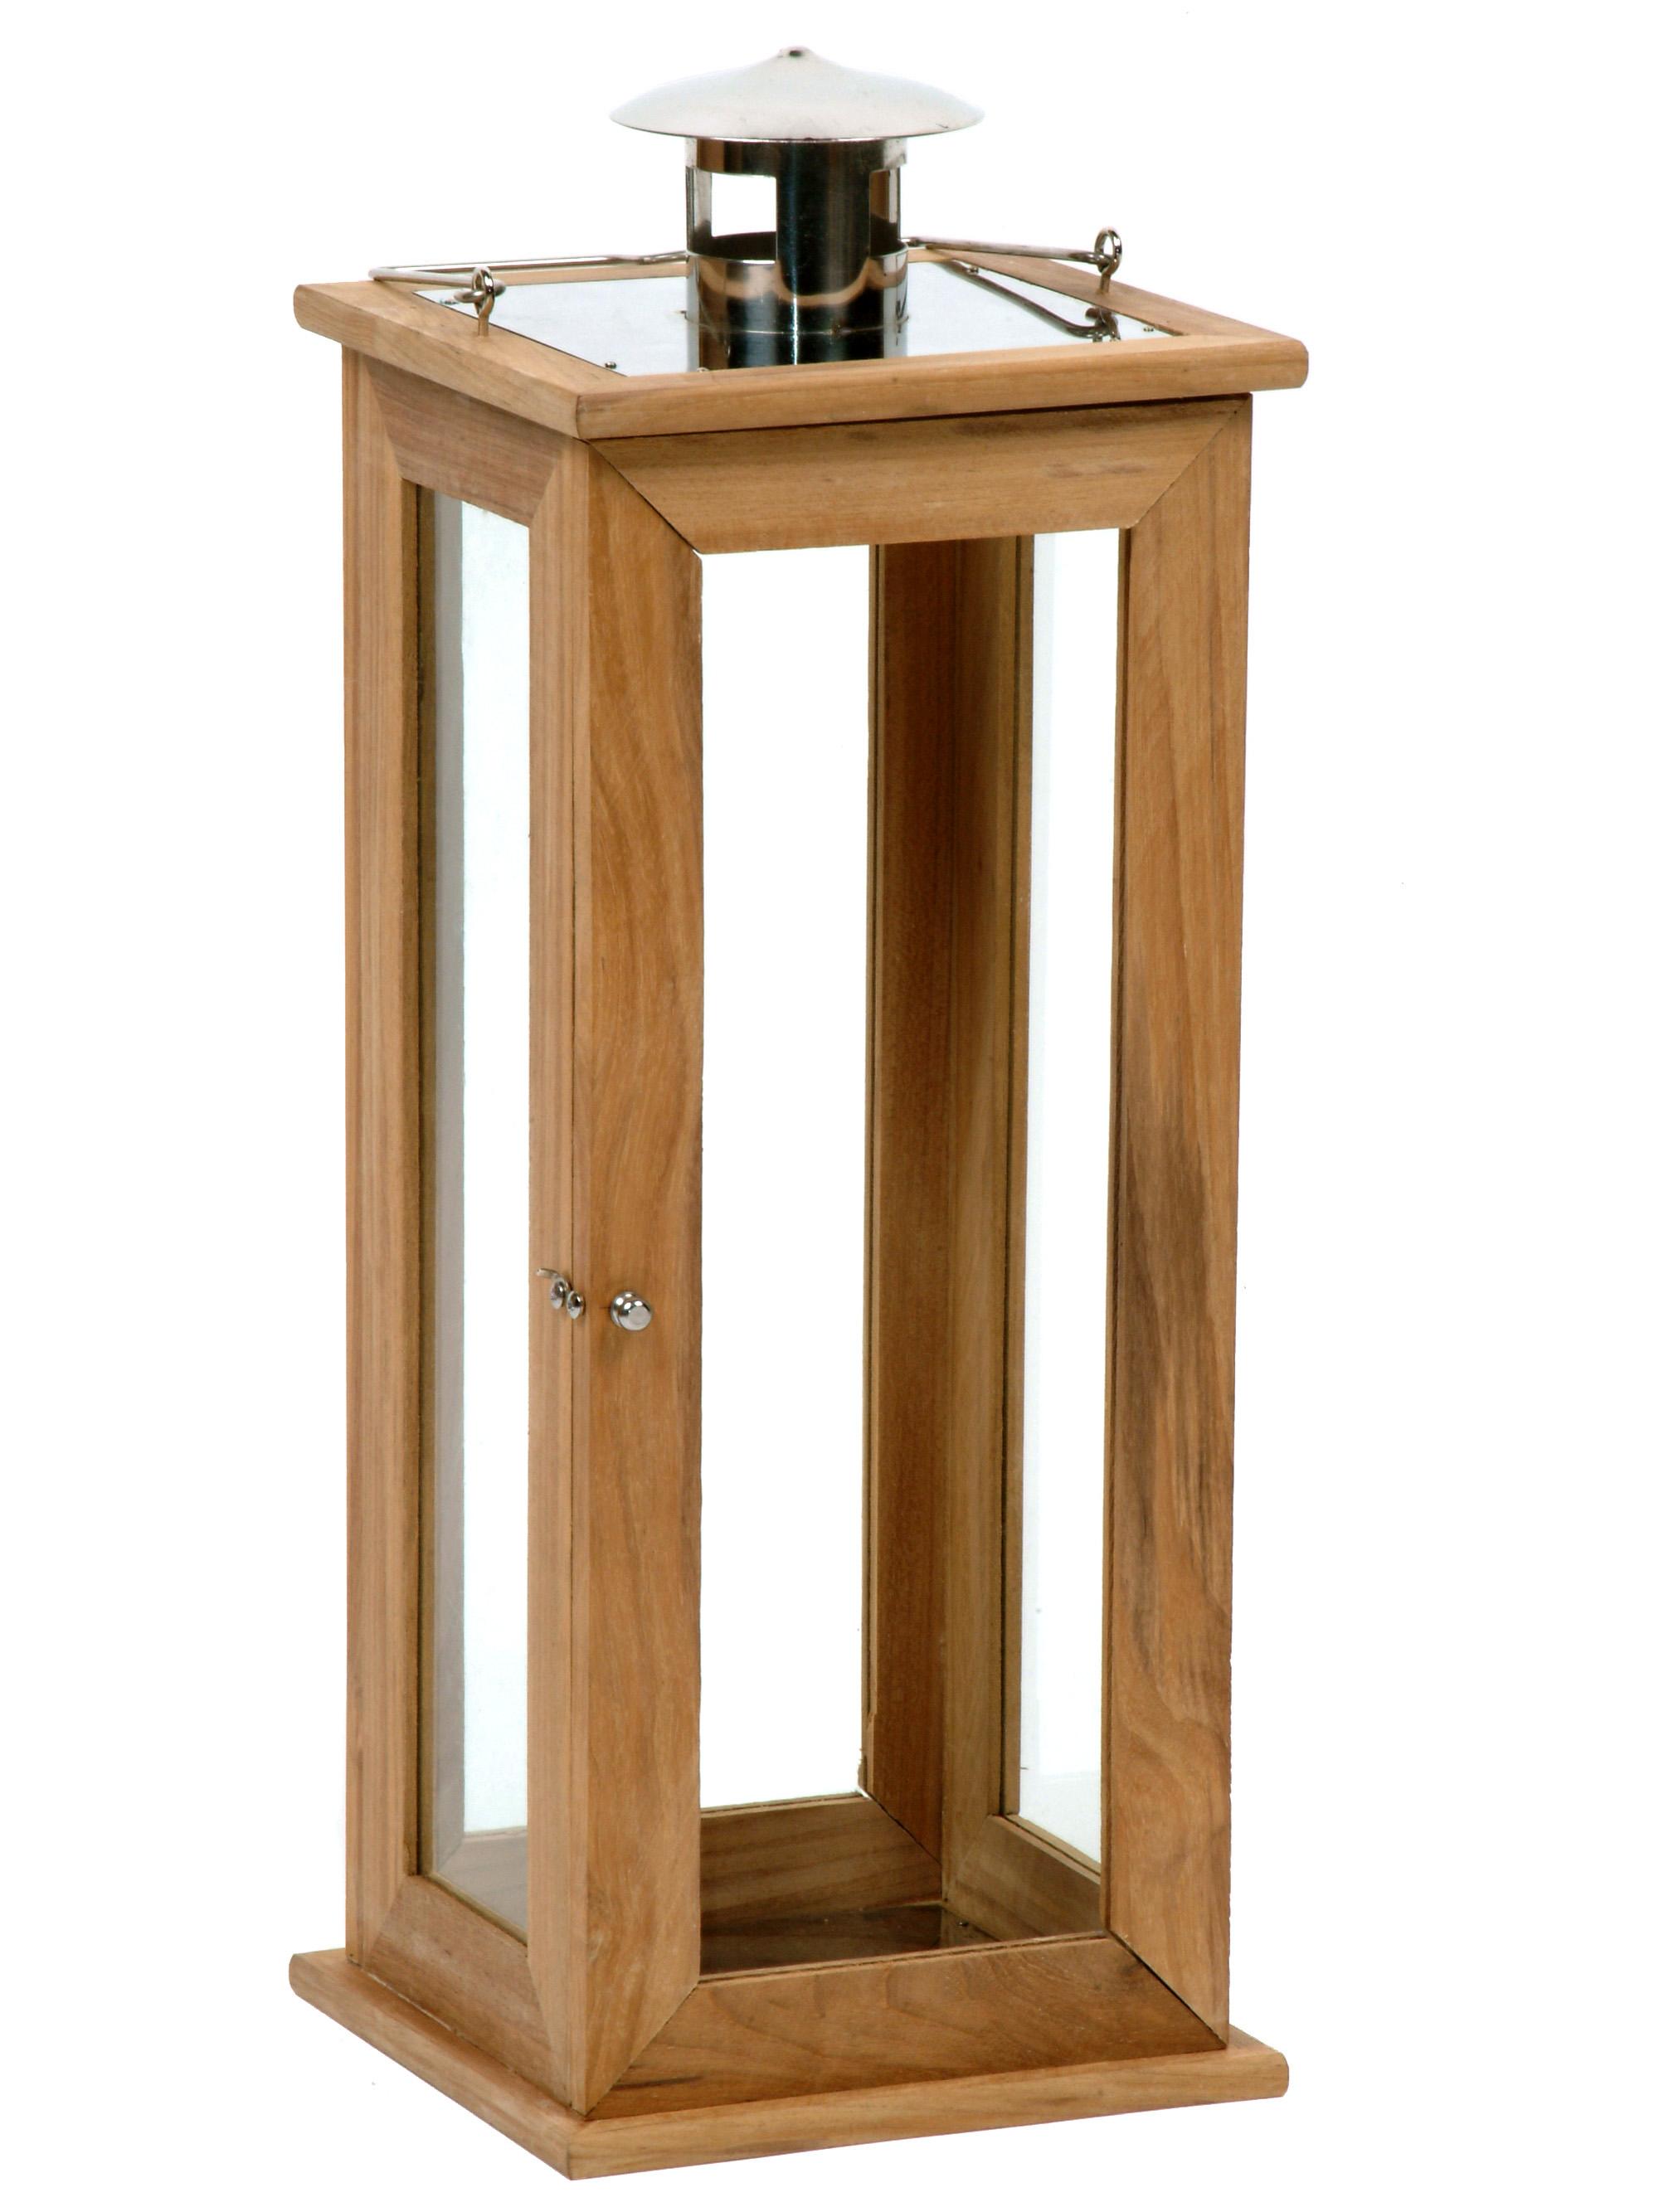 laterne holz glas f r blockkerze griff t r metall windlicht gartenlaterne gro ebay. Black Bedroom Furniture Sets. Home Design Ideas